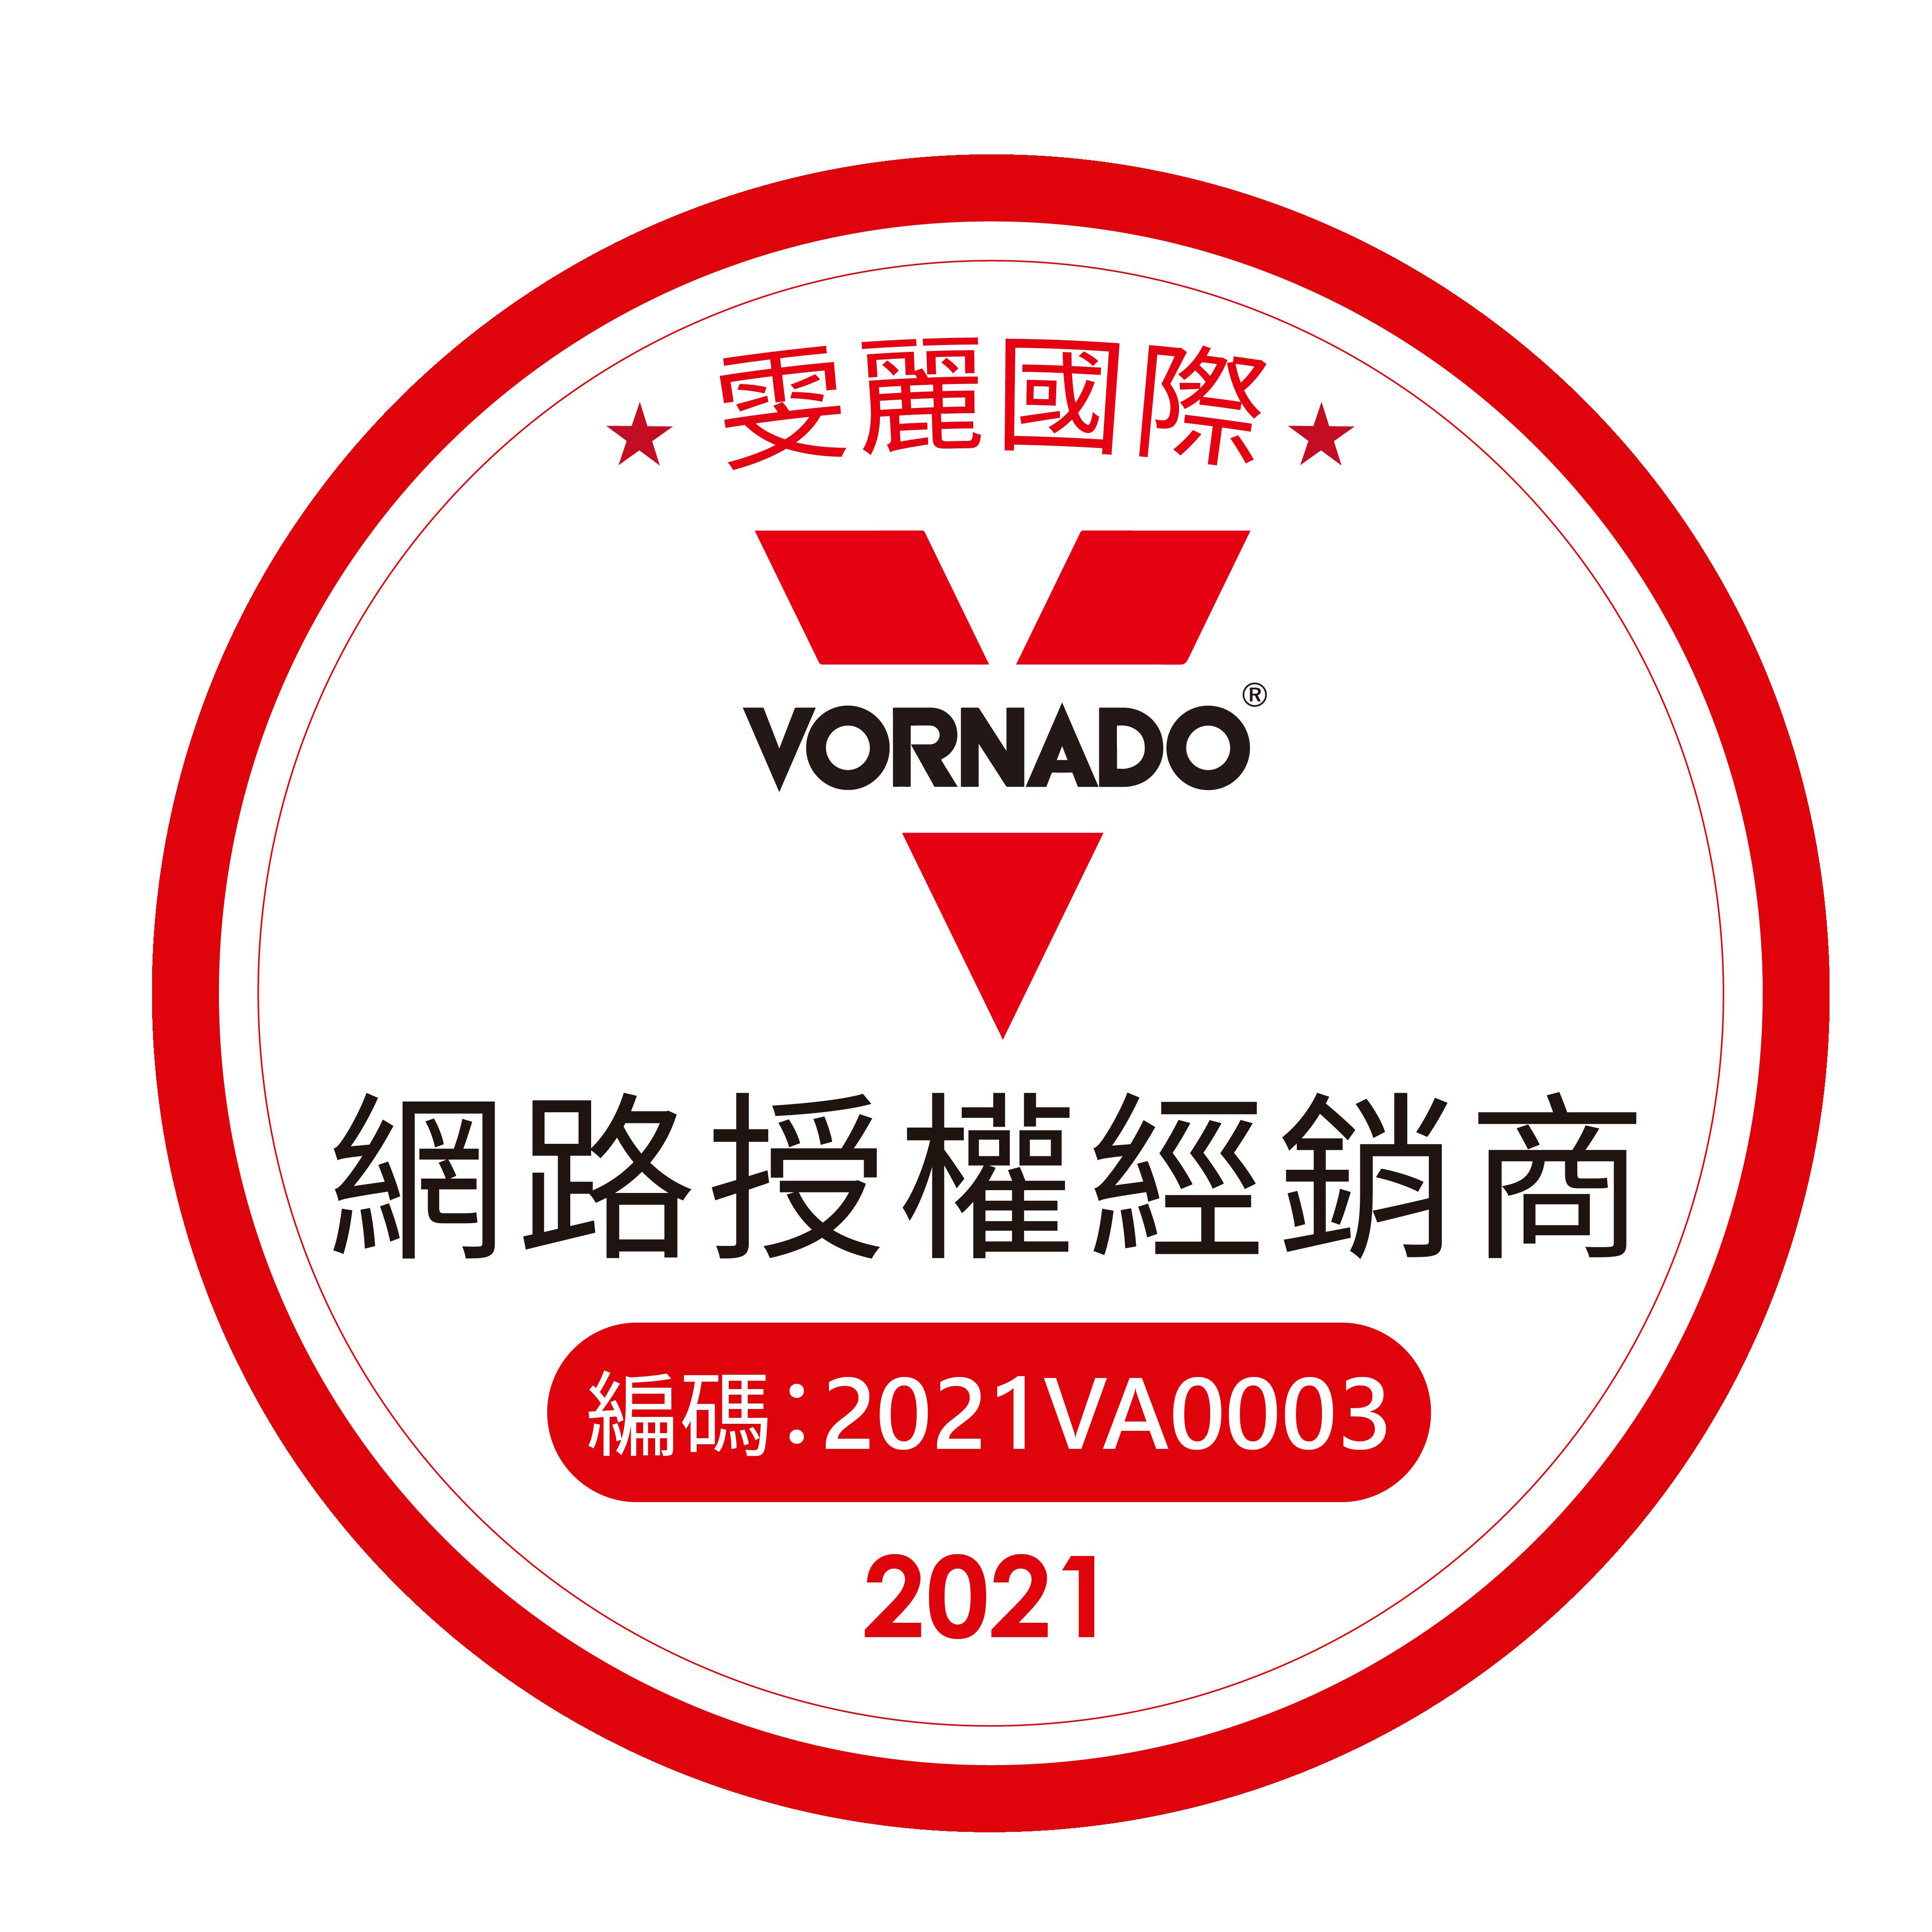 【VORNADO】5-8坪 渦流空氣循環扇(630B/630W)